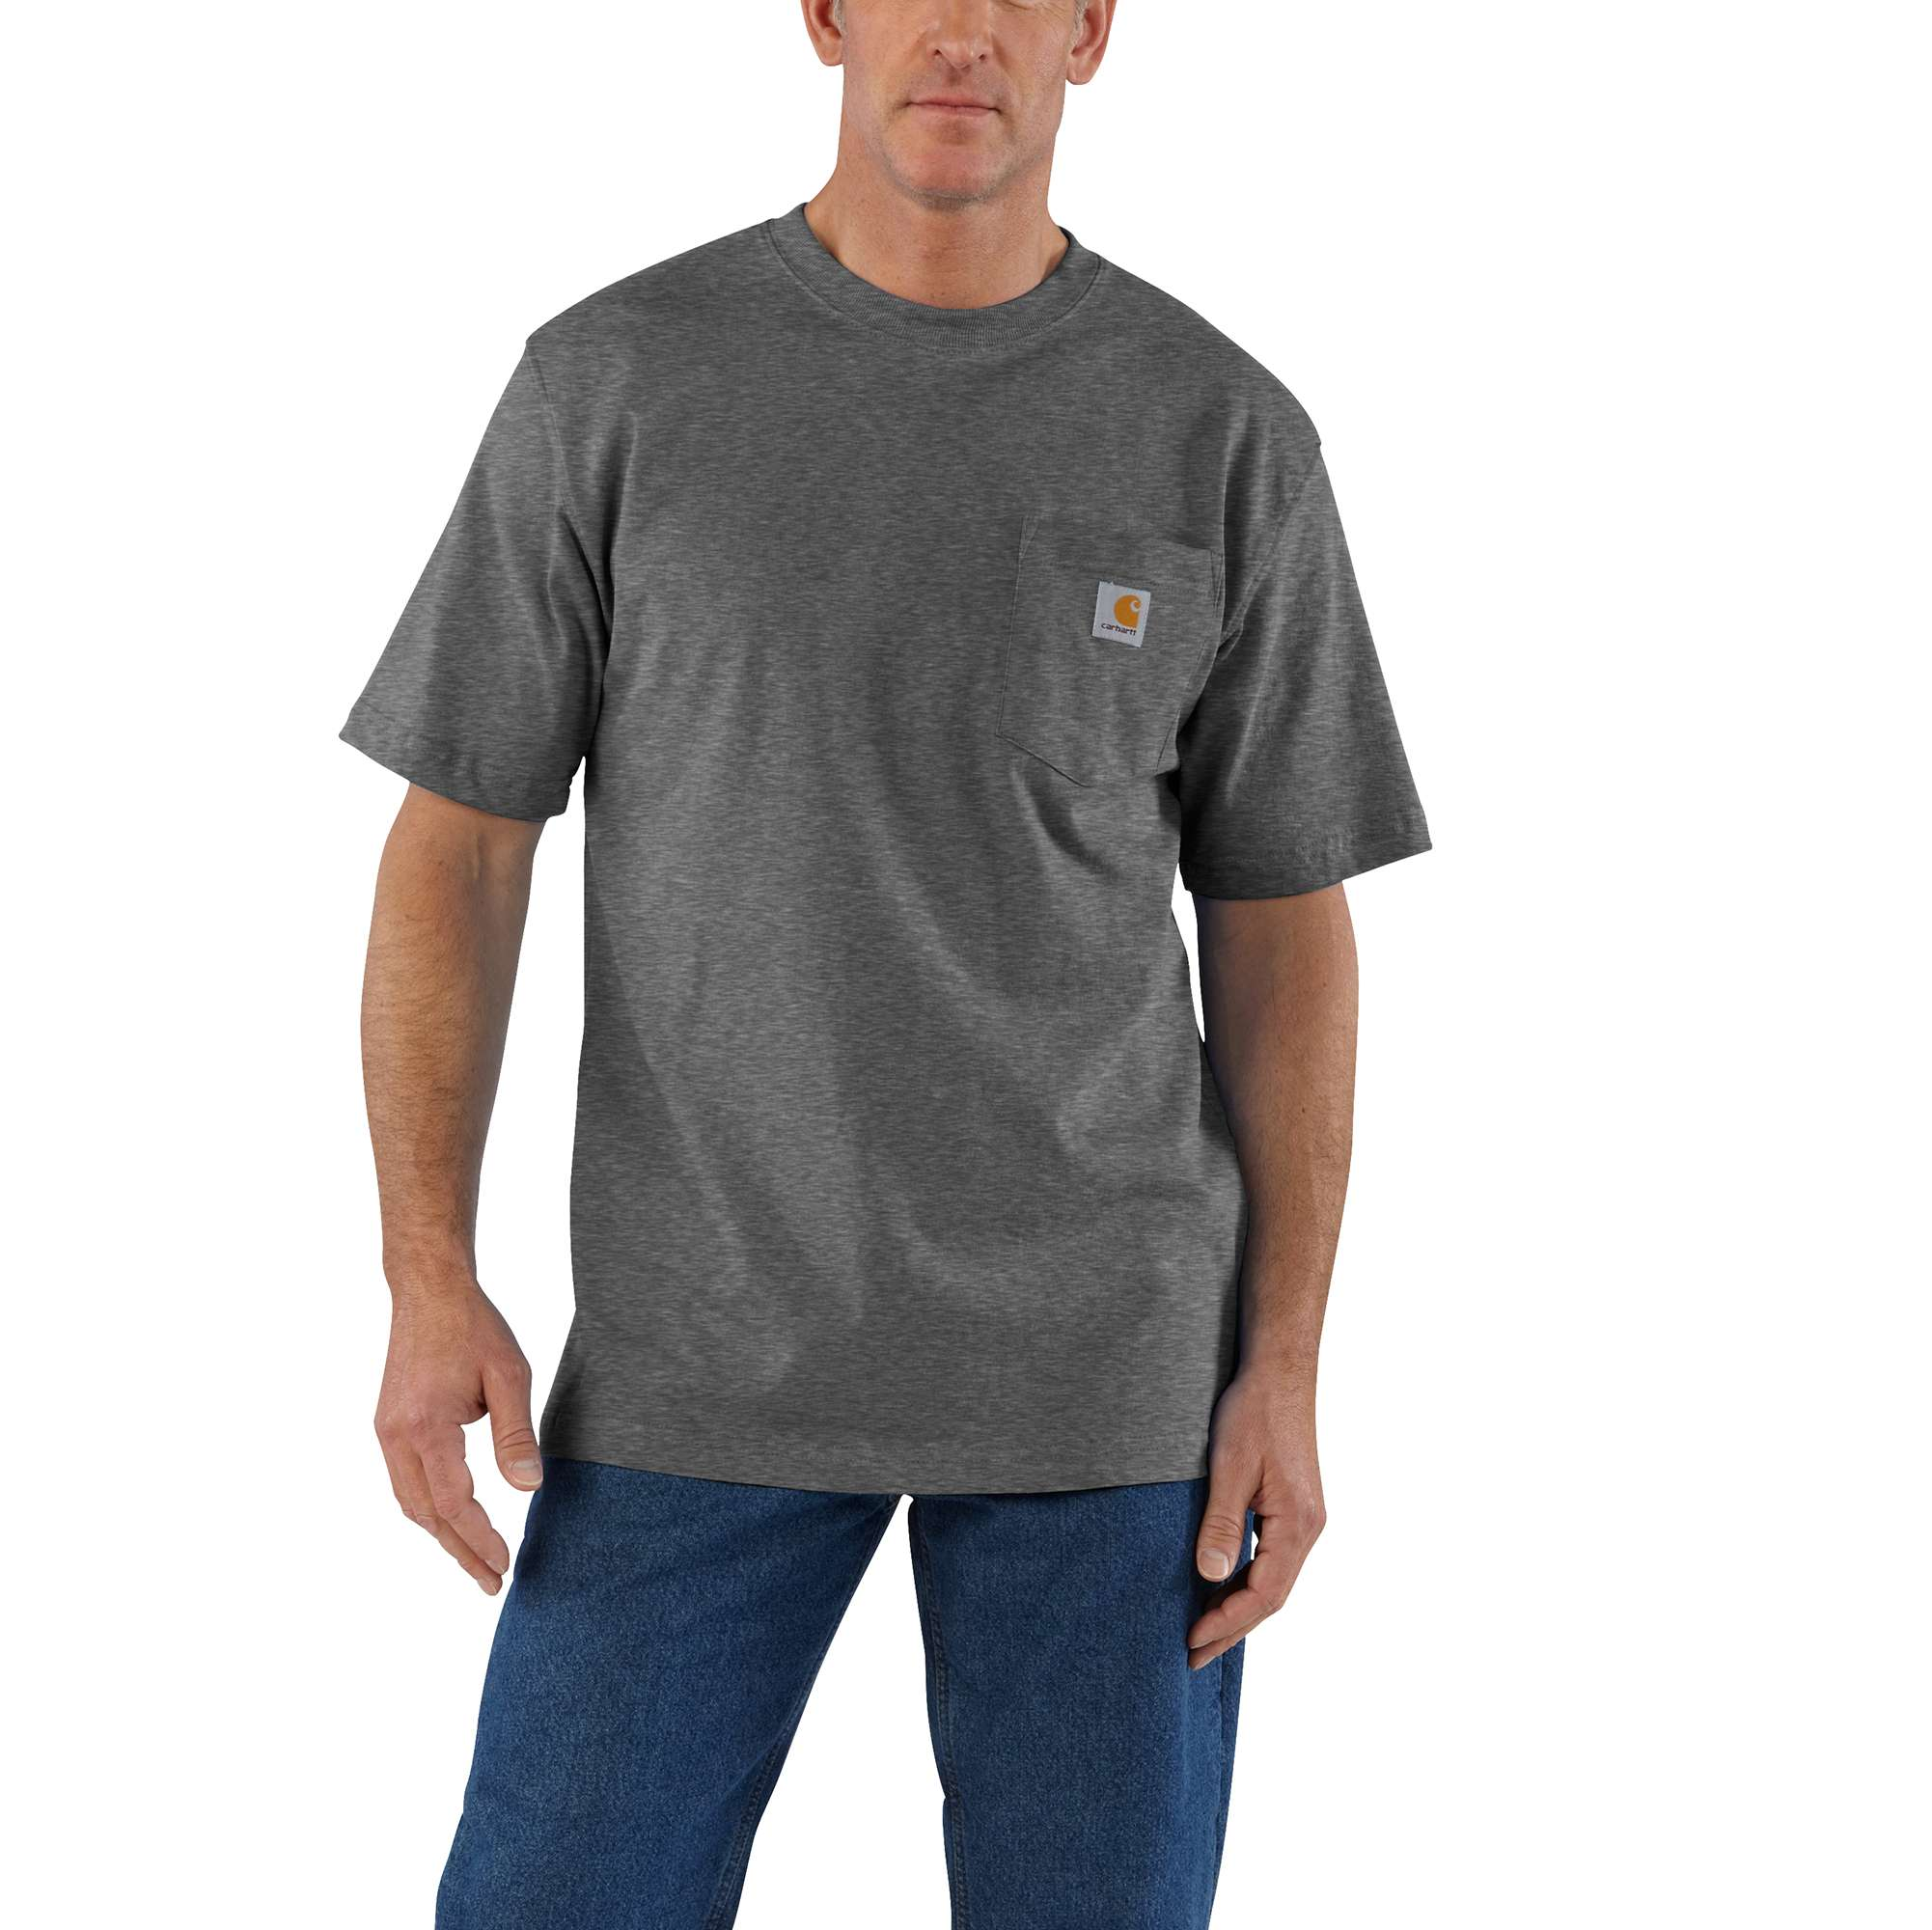 Men's Big & Tall Workwear Pocket T-Shirt, Gray, swatch